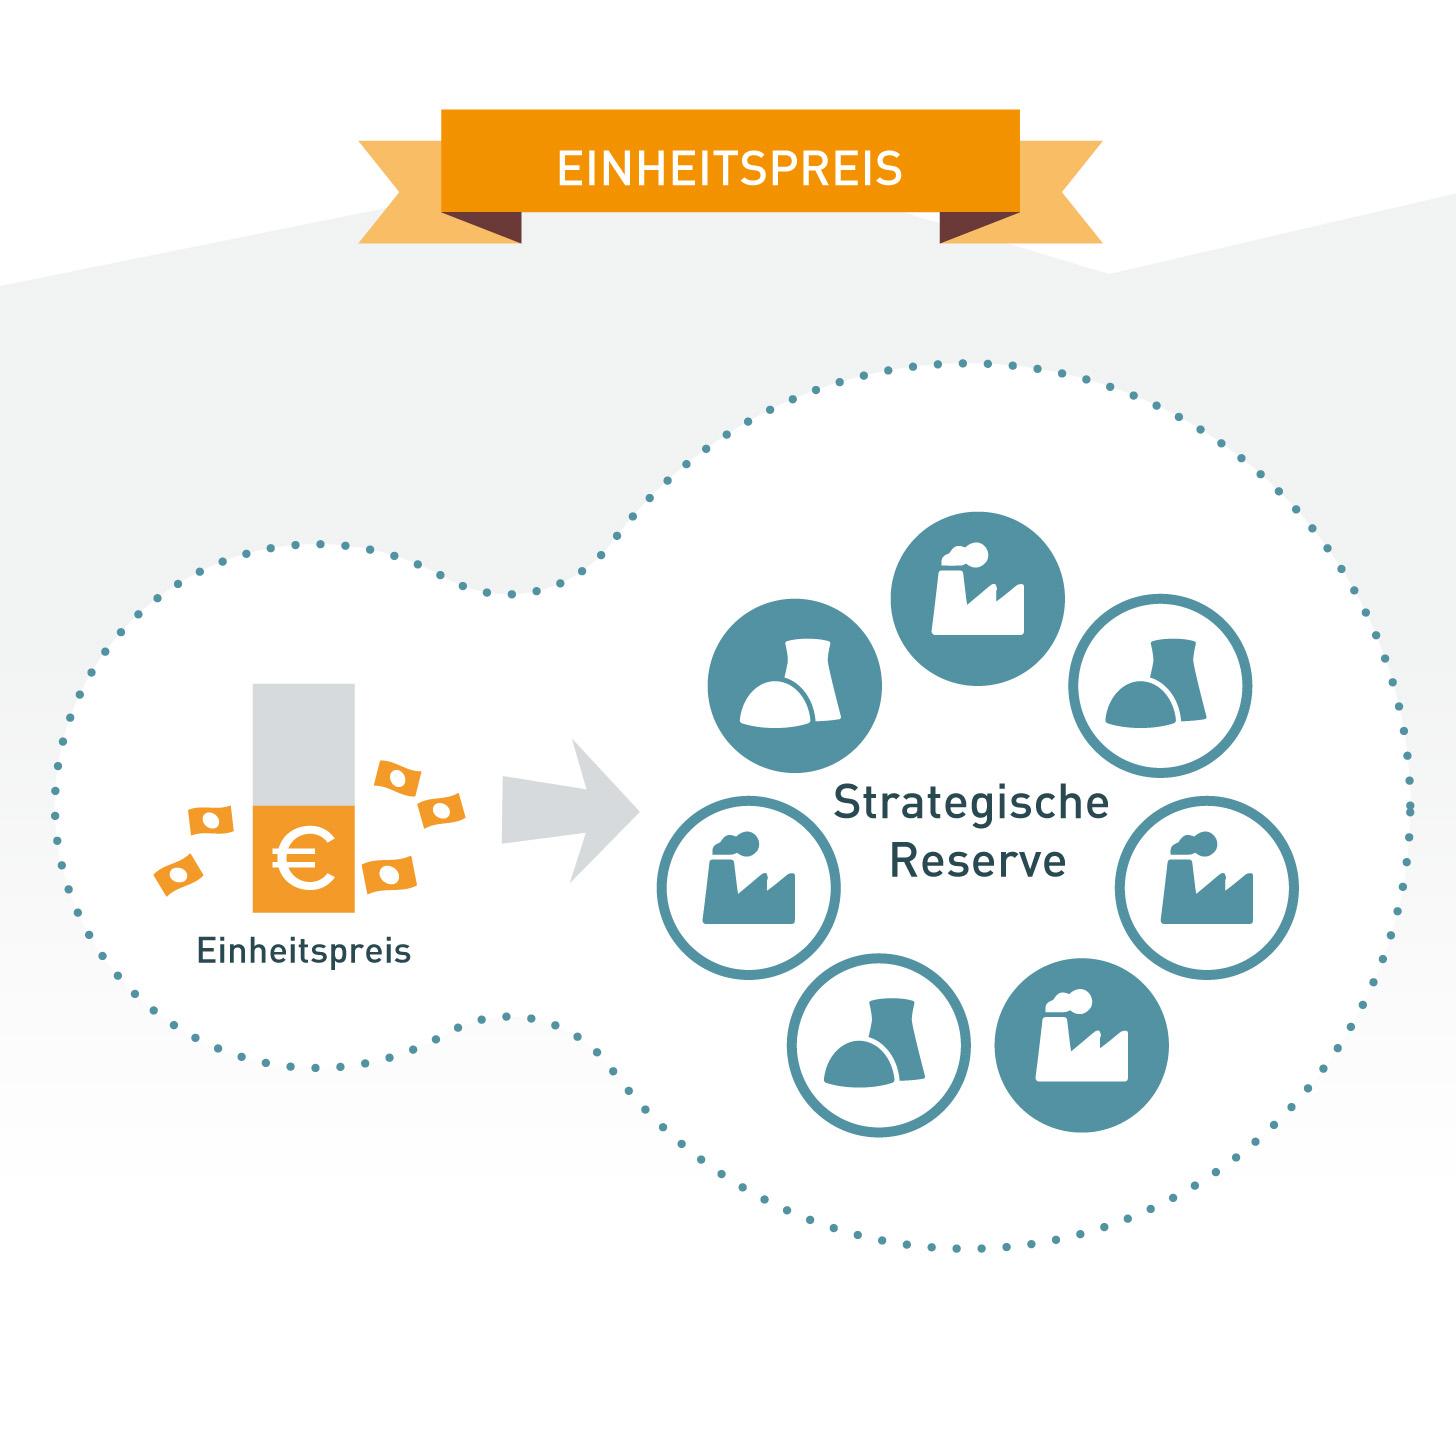 Strategische Reserve Kapazitätsmarktmodell